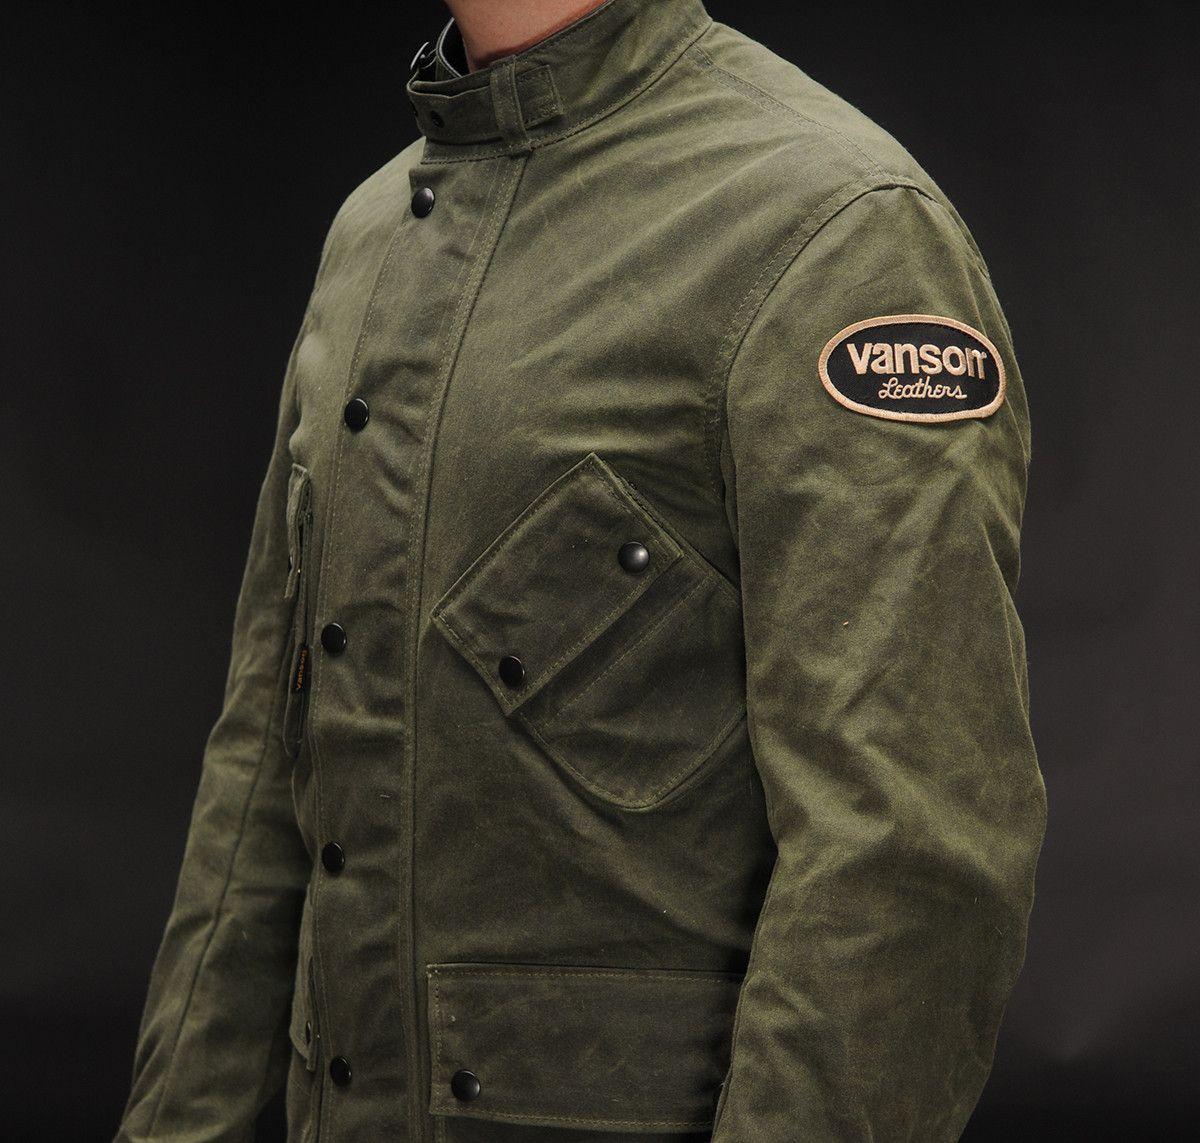 6797dfa3b Vanson Stormer Waxed Cotton Jacket | سترا رجالي in 2019 | Waxed ...